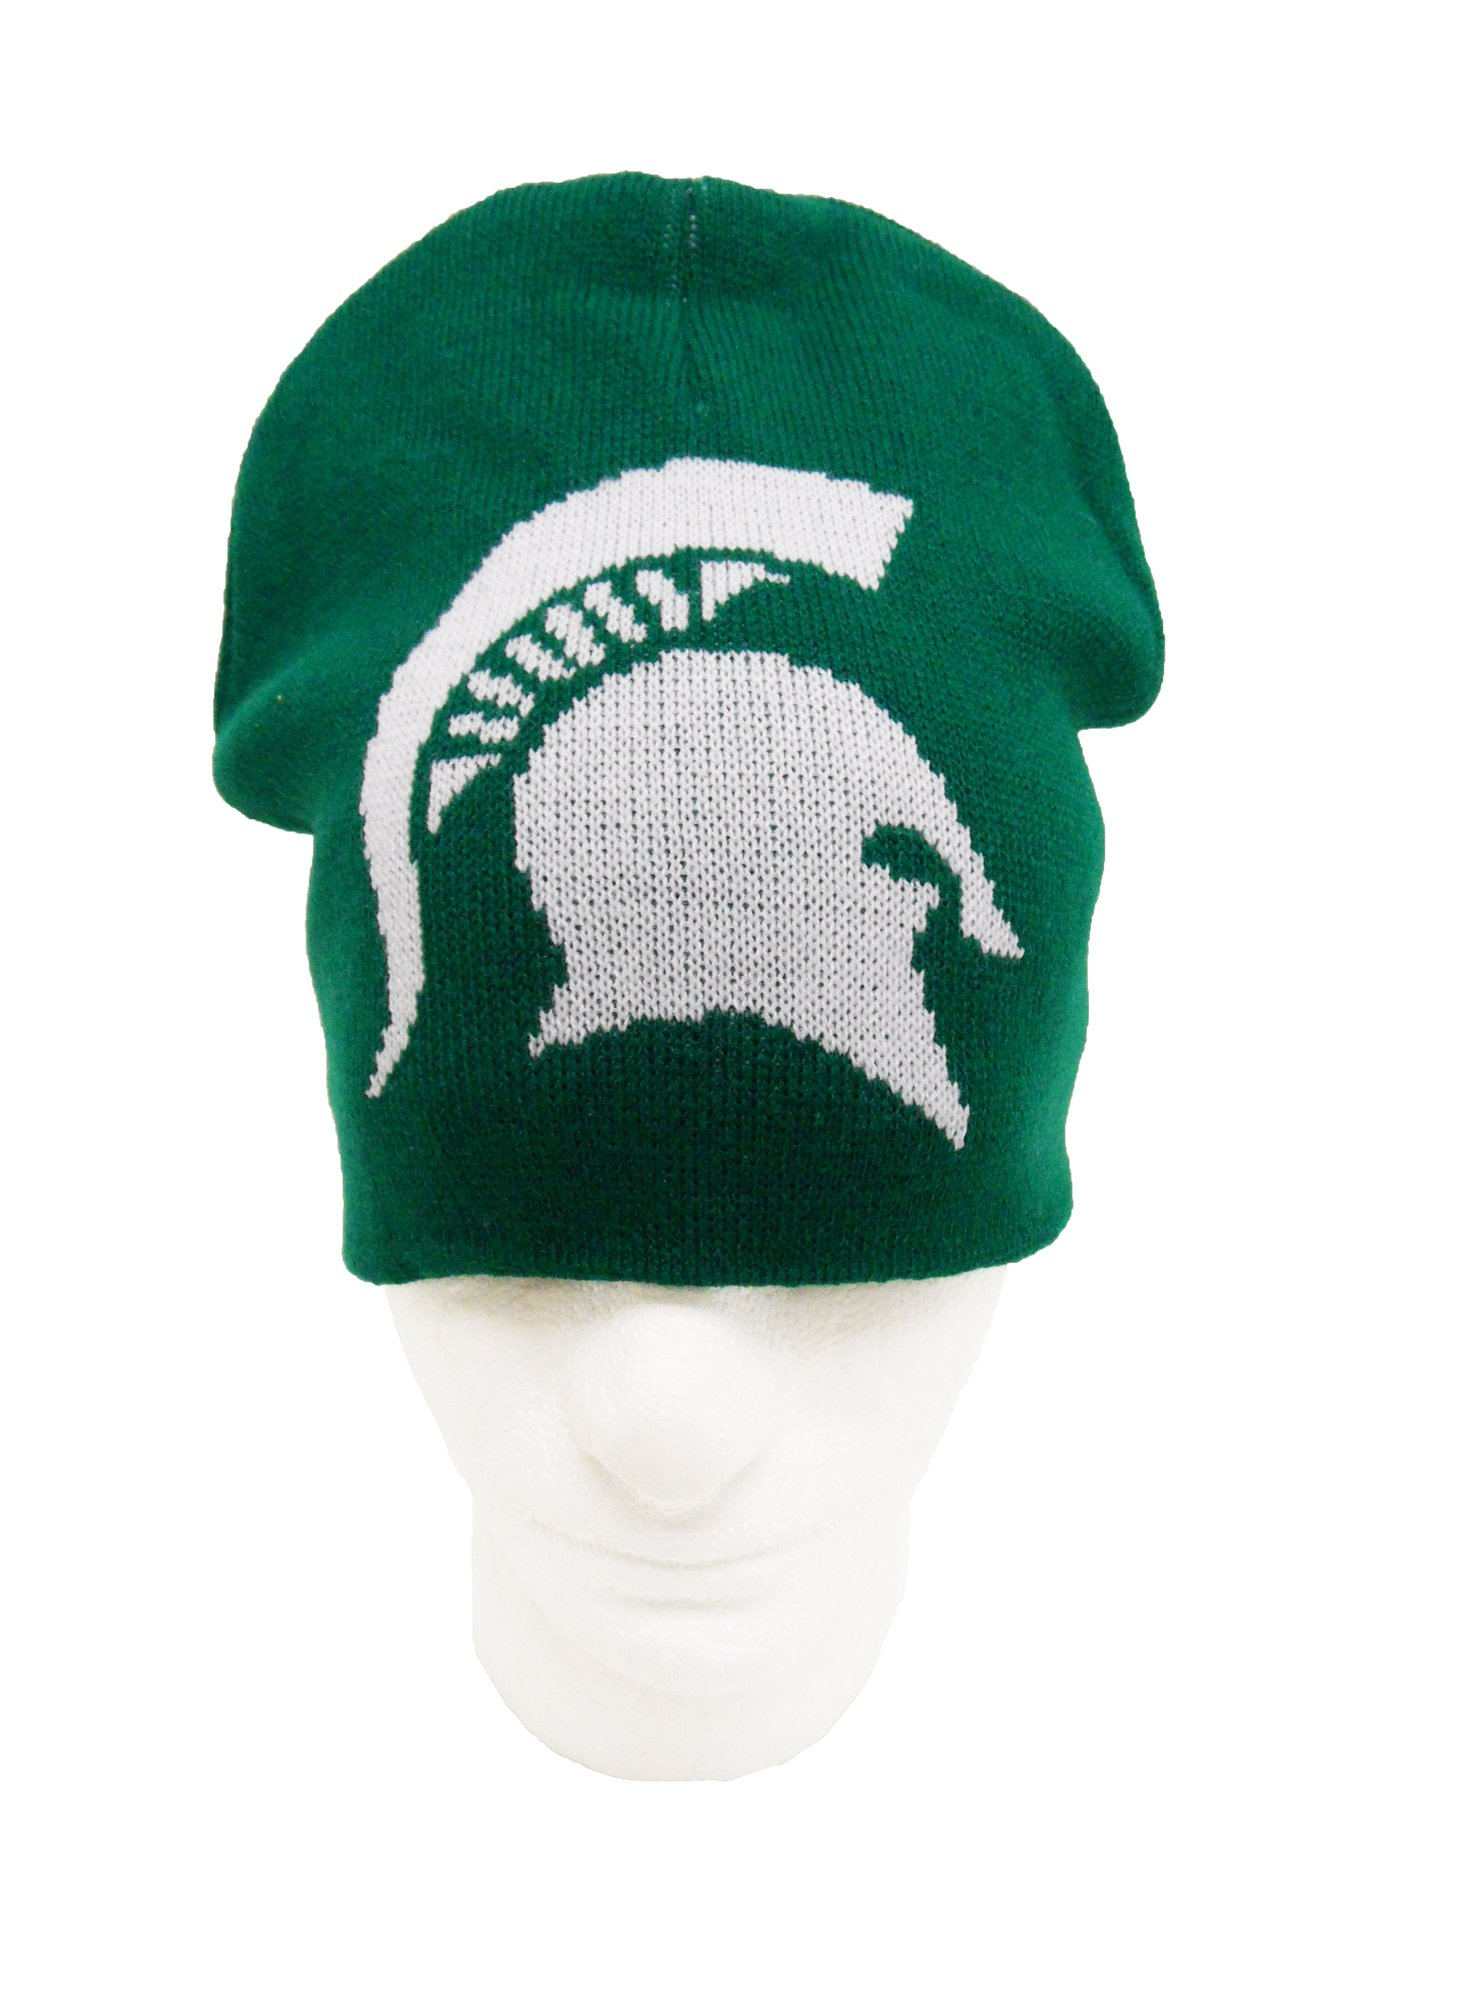 NCAA Michigan State Spartans Men's University Jacquard Knit Beanie